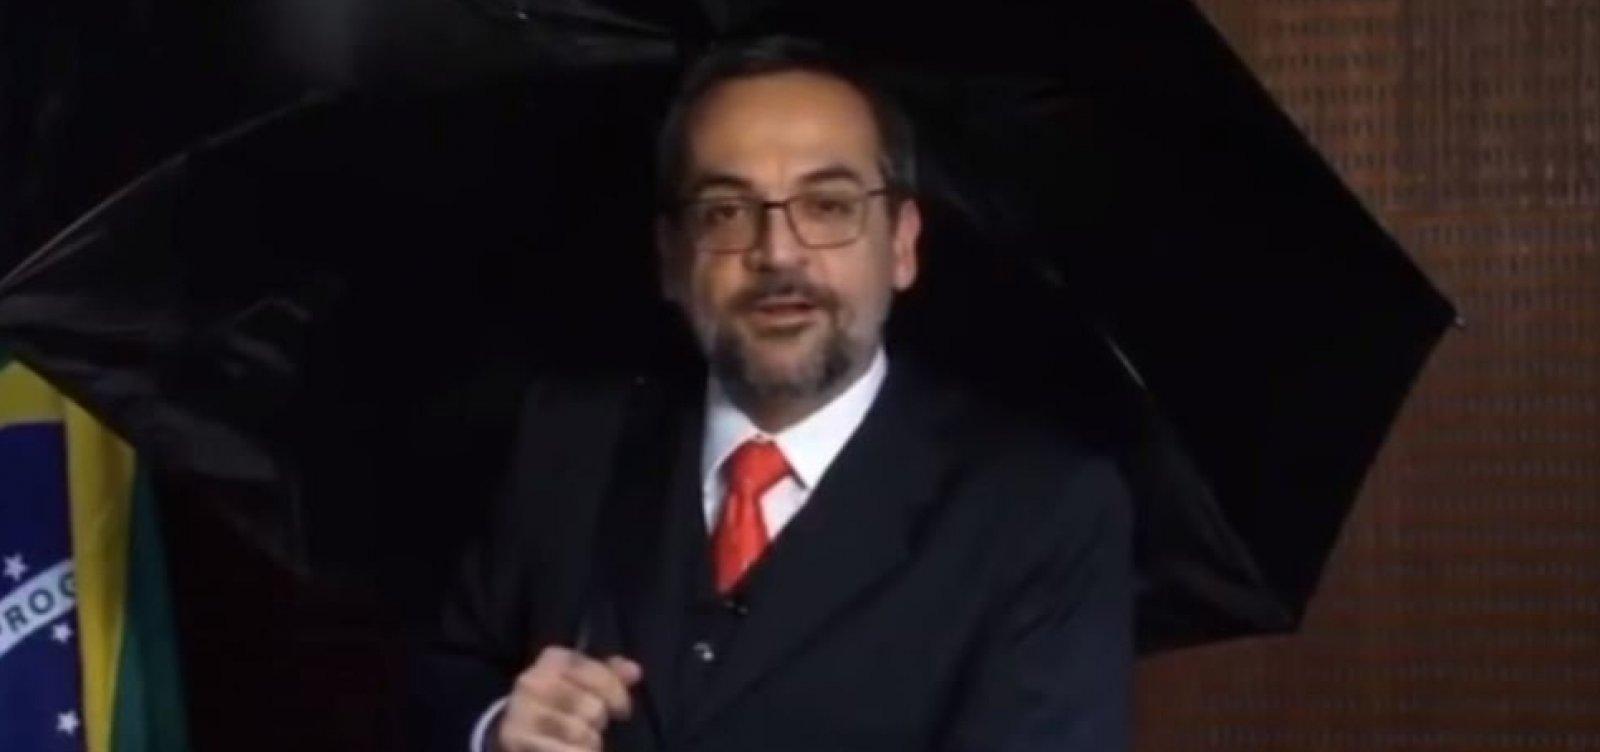 [Veja: ao estilo 'Singin' in the Rain', Weintraub grava vídeo contra fake news]